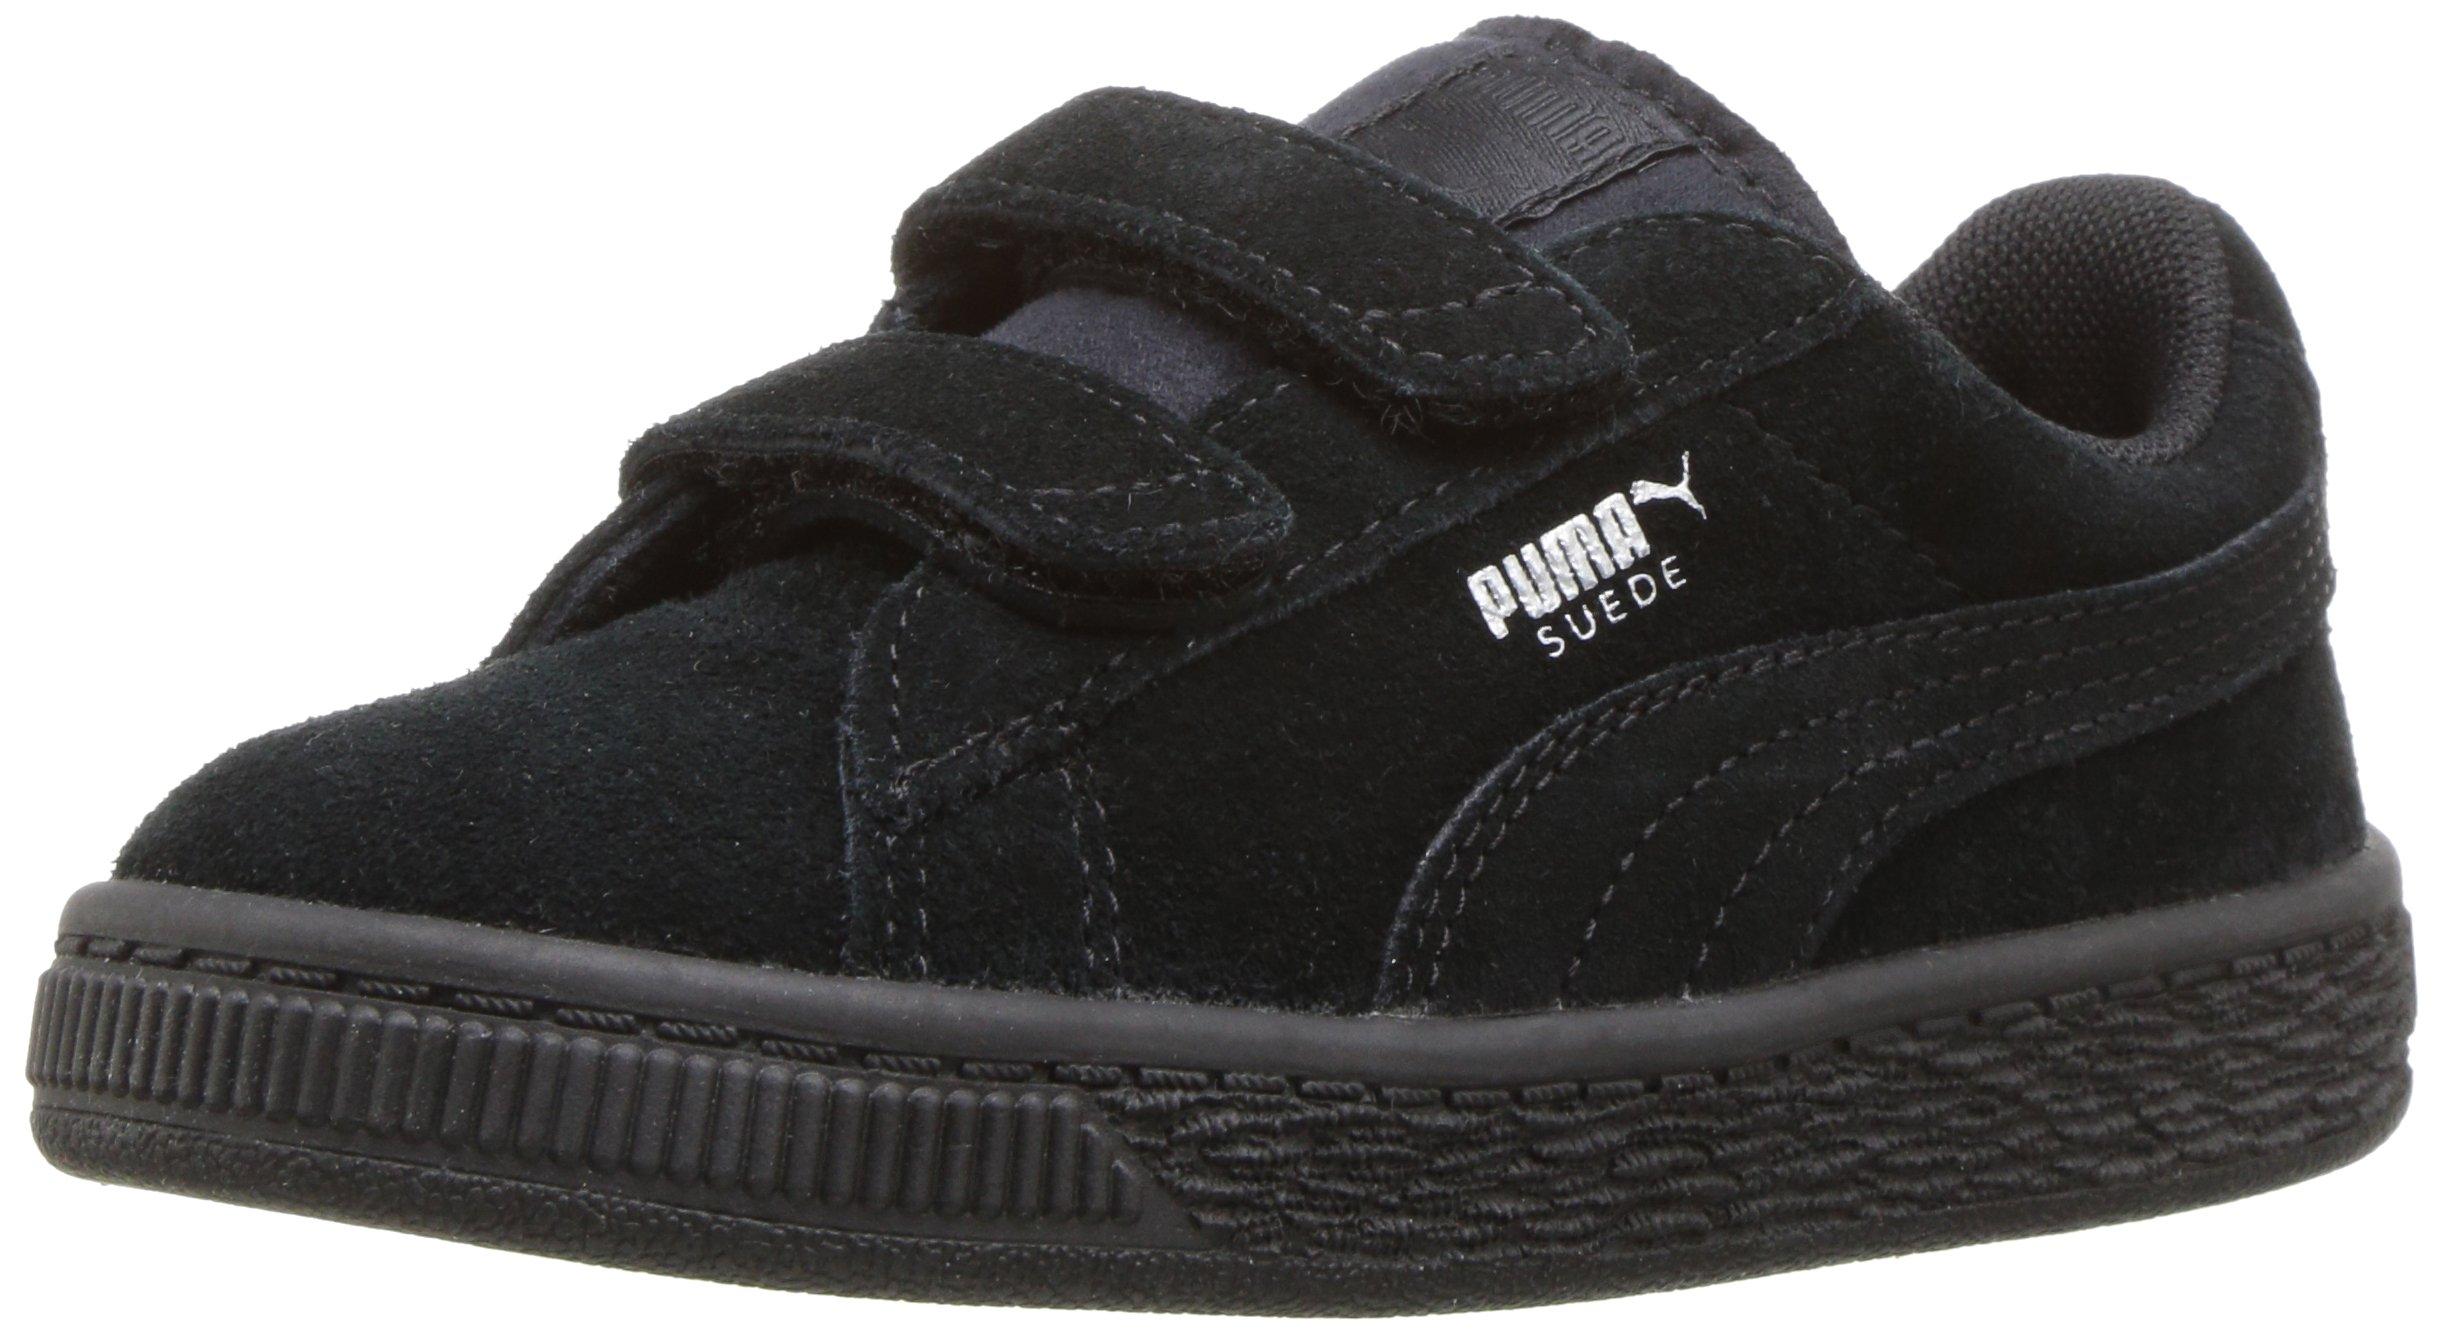 PUMA Baby Suede 2 Straps Kids Sneaker, Black Silver, 10 M US Toddler